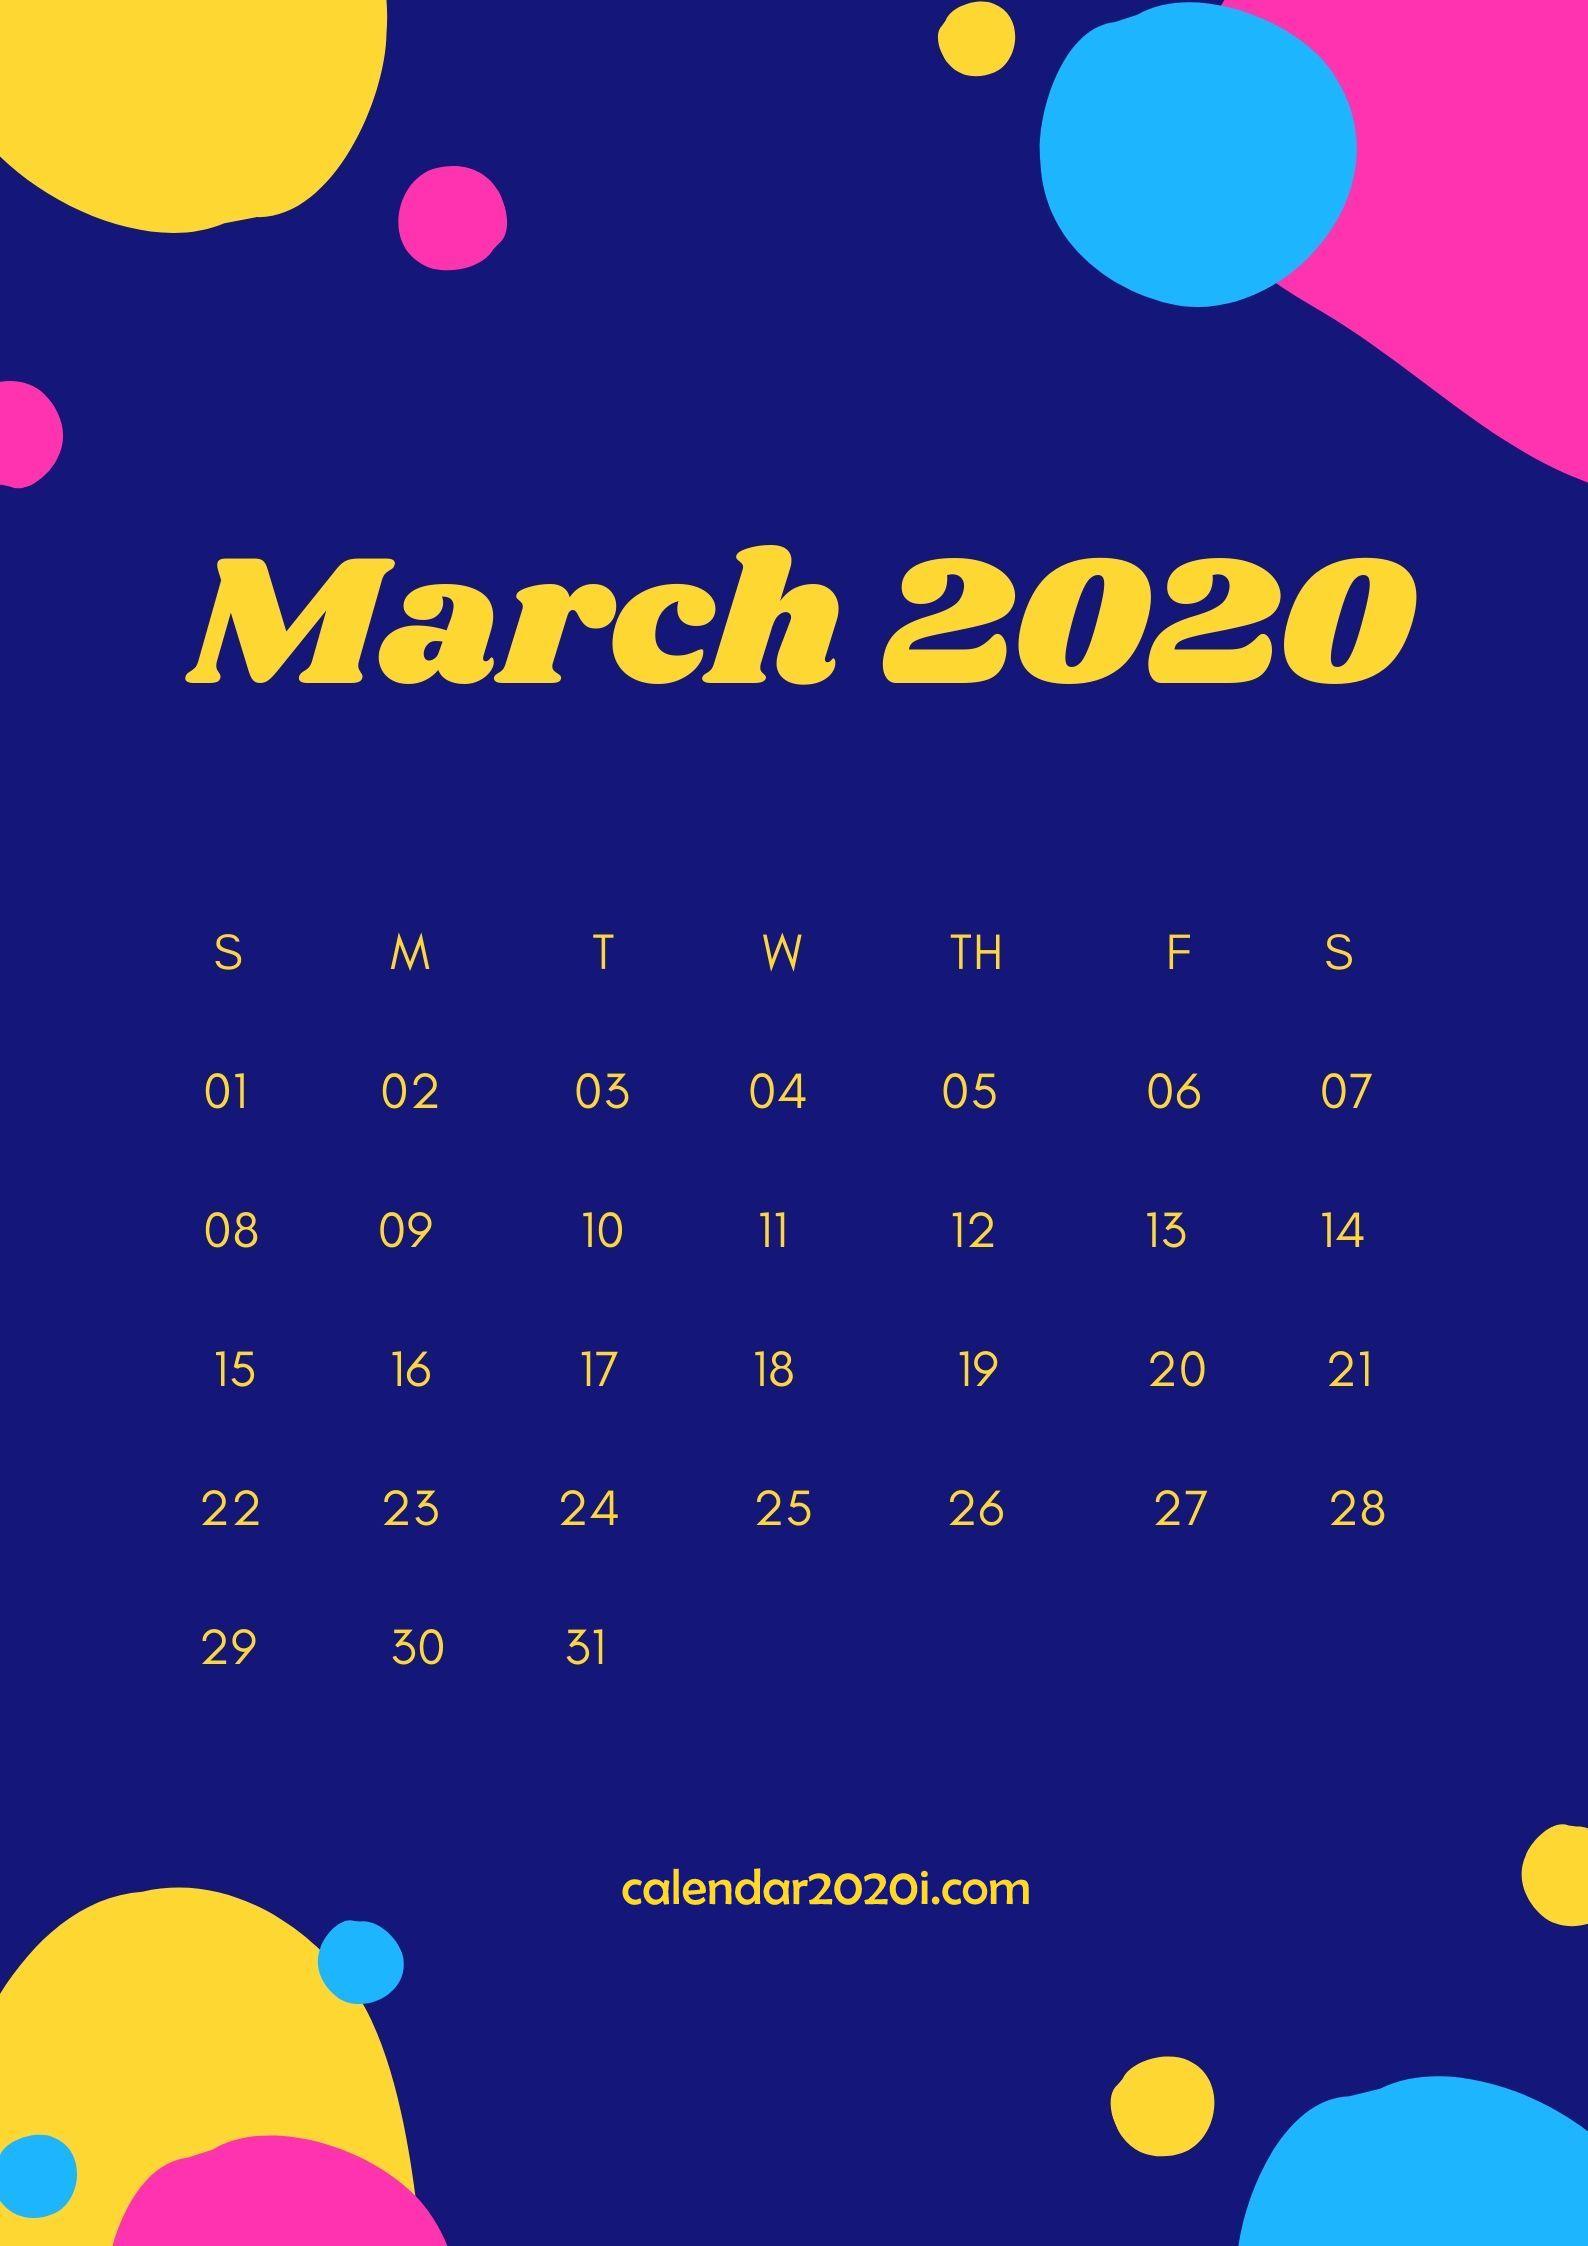 March 2020 Wall Calendar Printable